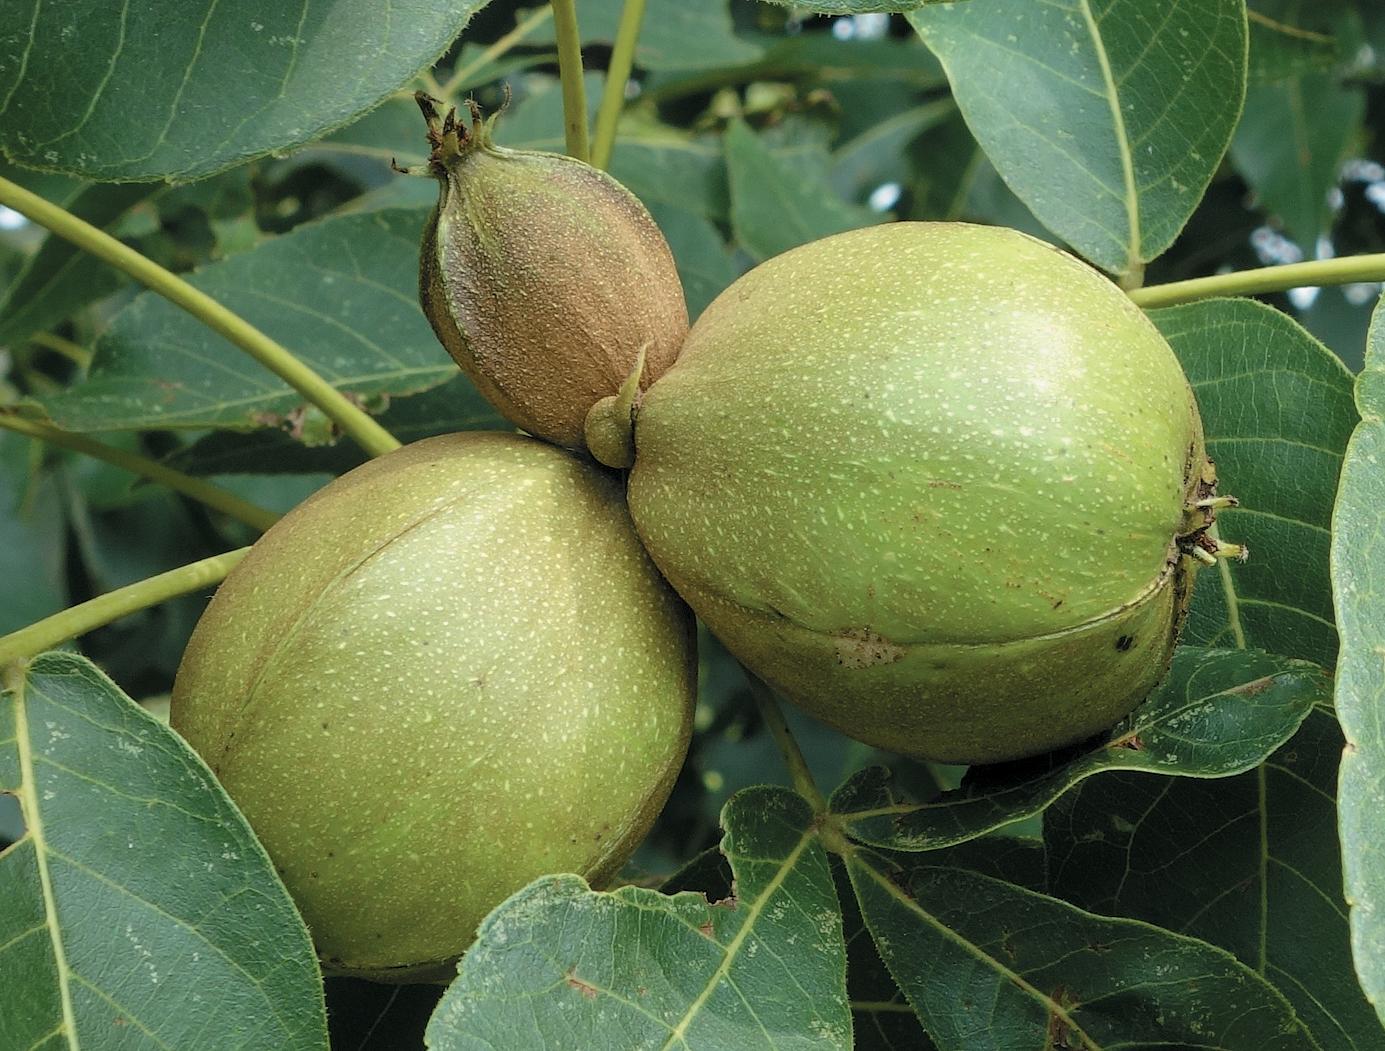 Hickory fruit against green leaves